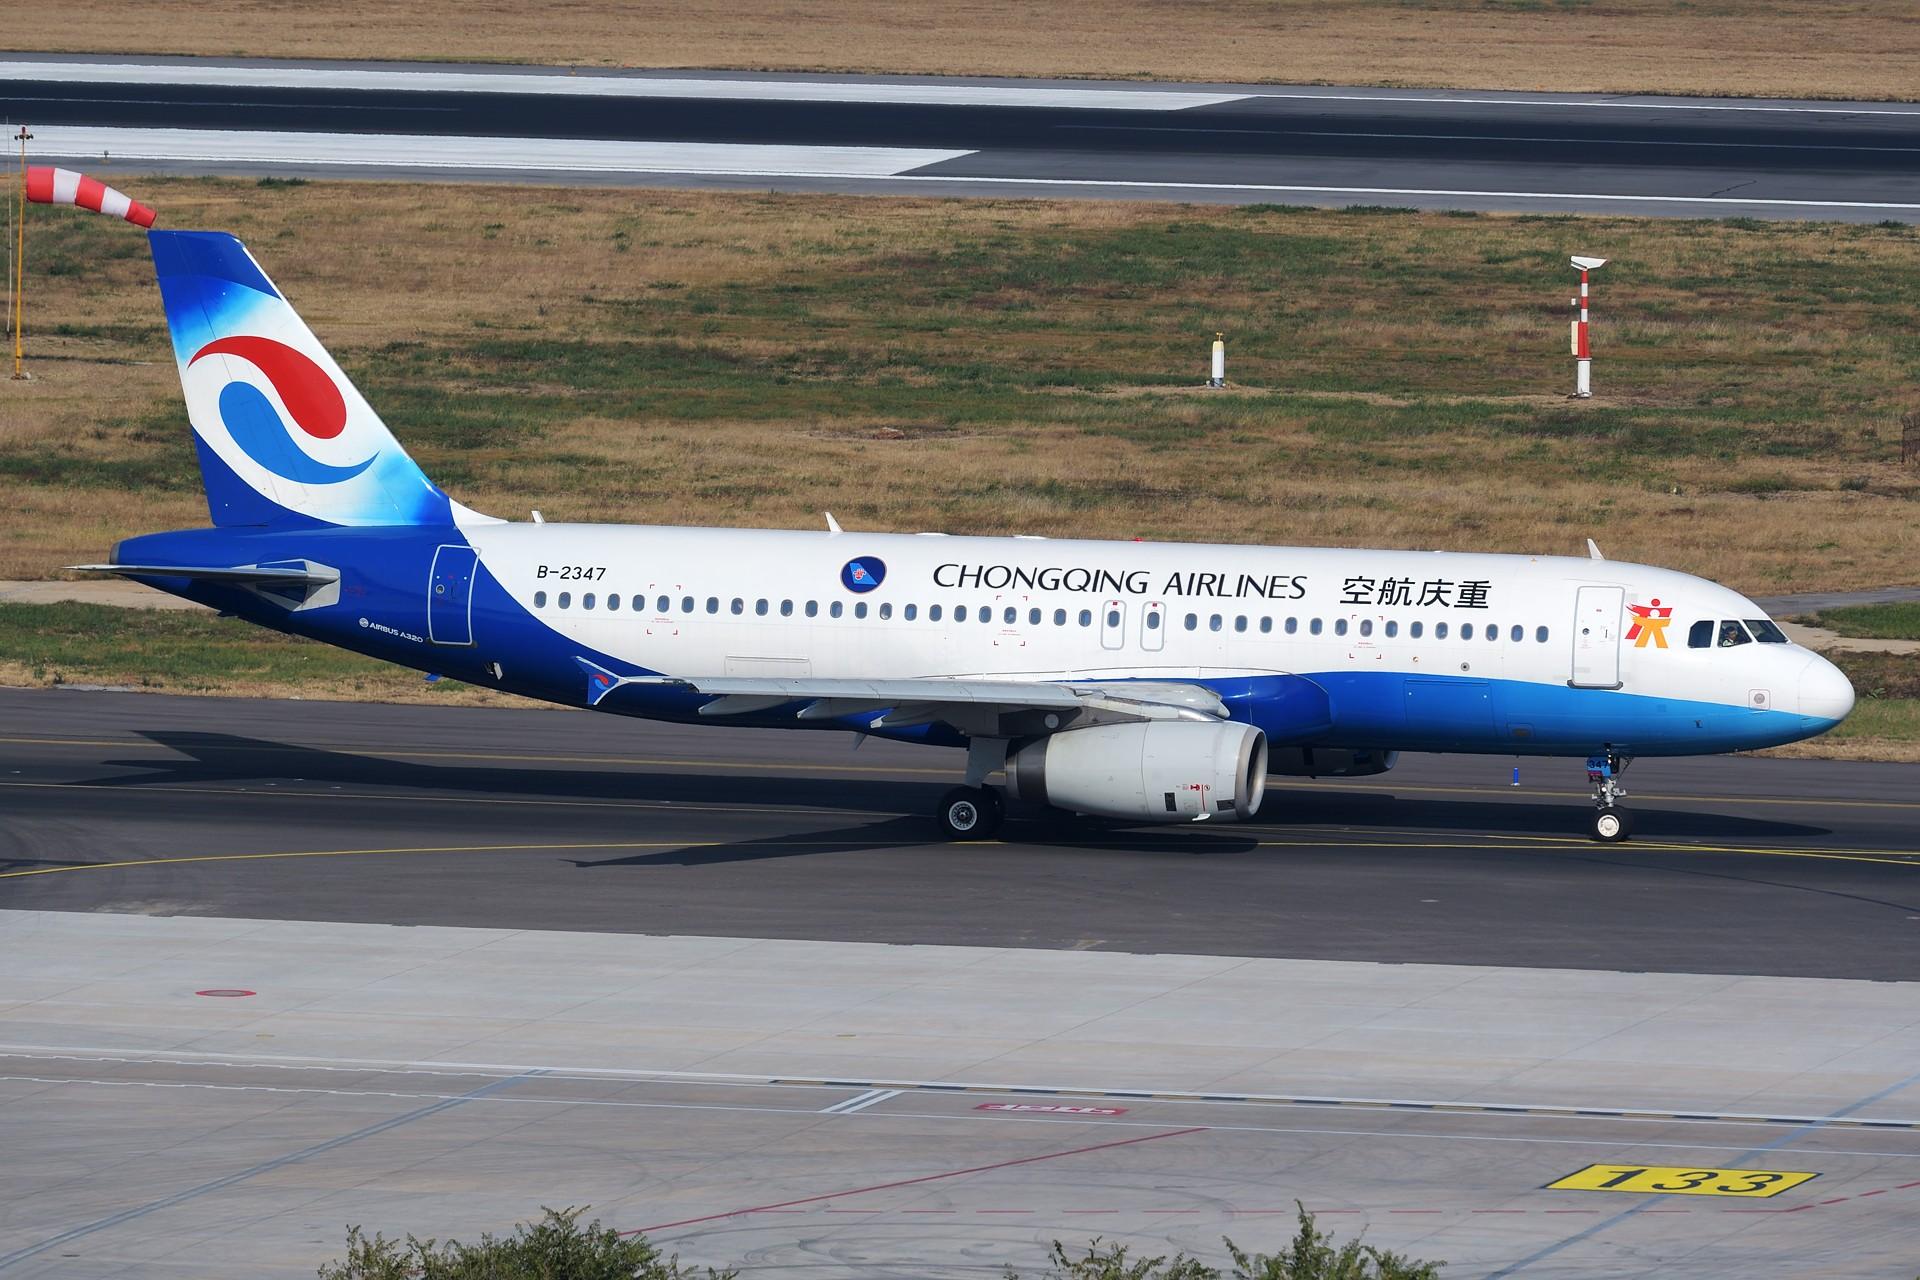 Re:[原创]★[DLC]一点有趣的事情(国庆加点儿料)★ AIRBUS A320-200 B-2347 中国大连国际机场